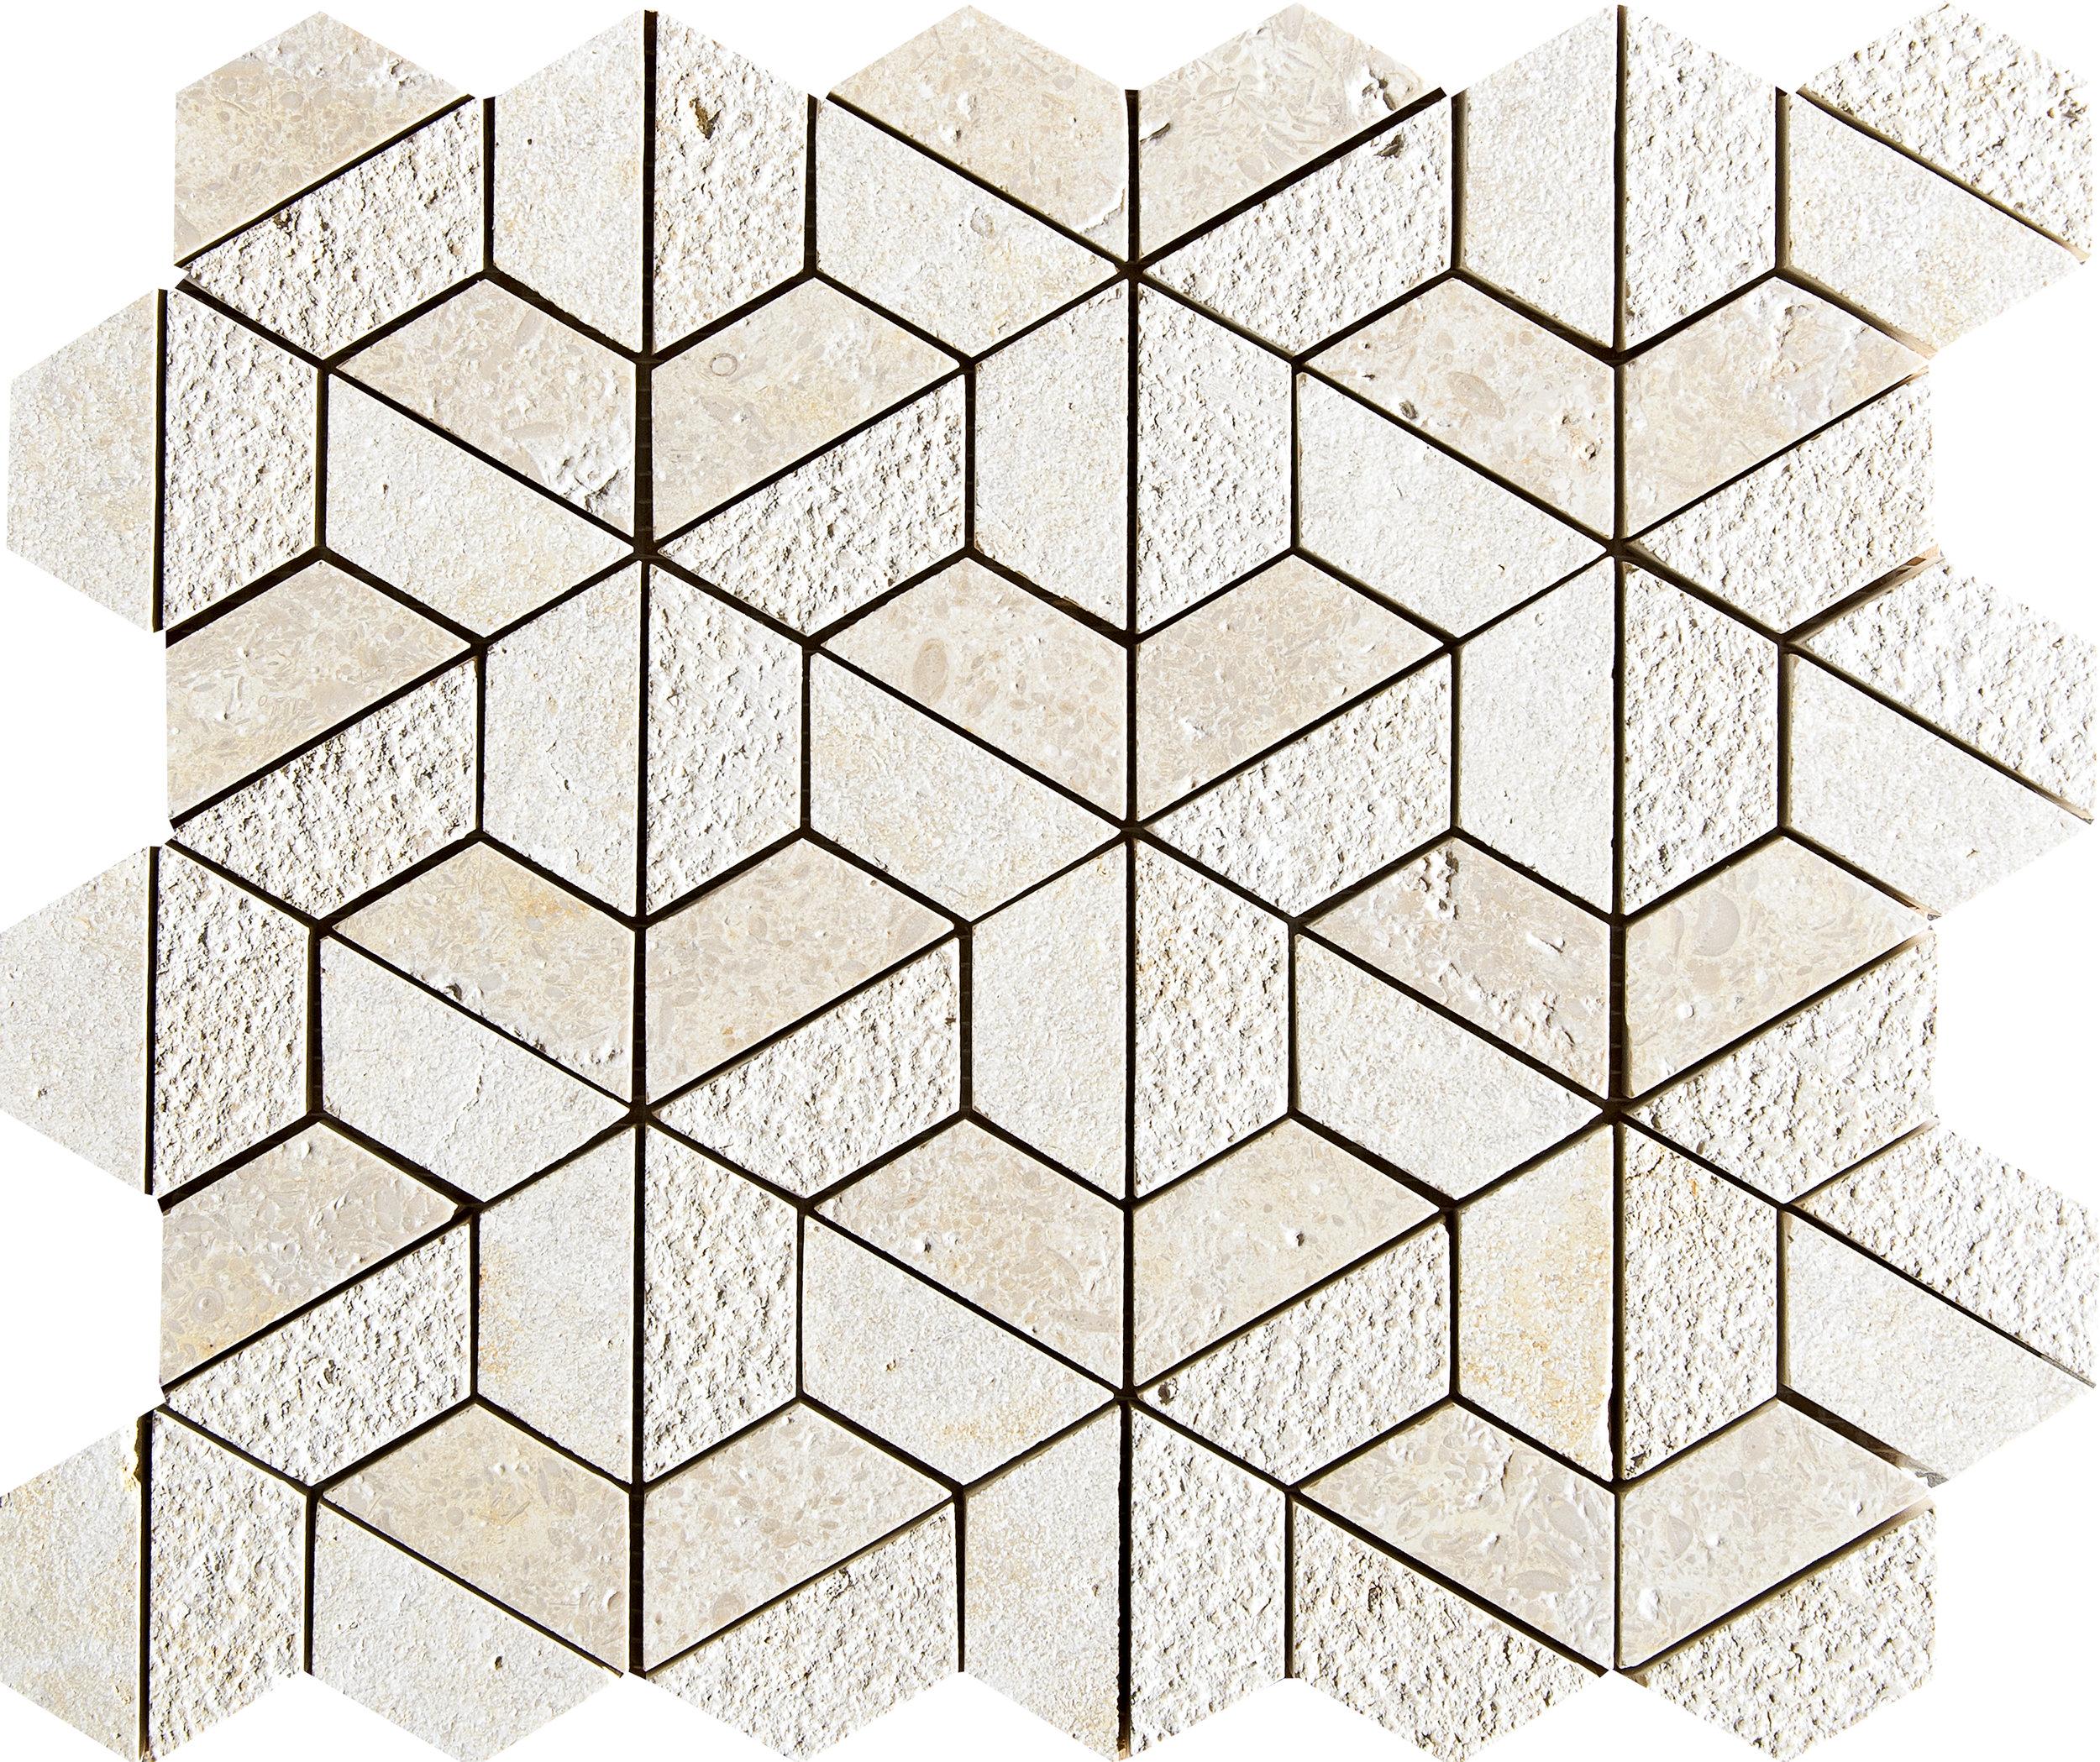 "MS01274 seashell 3d hexagon textured 3/8"" mosaic 10 3/8""x12""x3/8"""